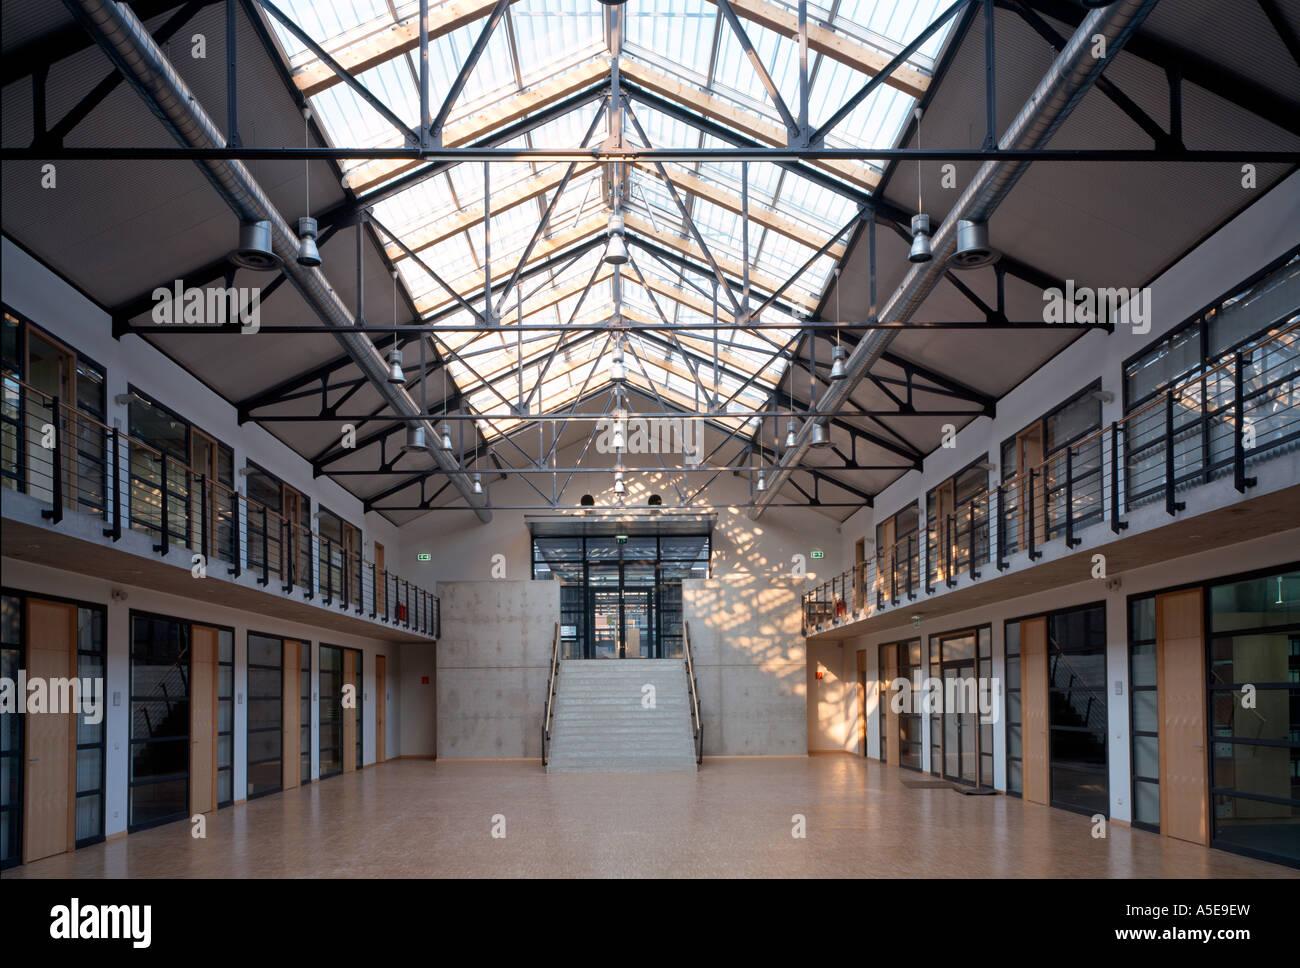 Gelsenkirchen, ehemalige Zeche Nordstern, BUGA 97, ehemalige Lohnhalle Stock Photo